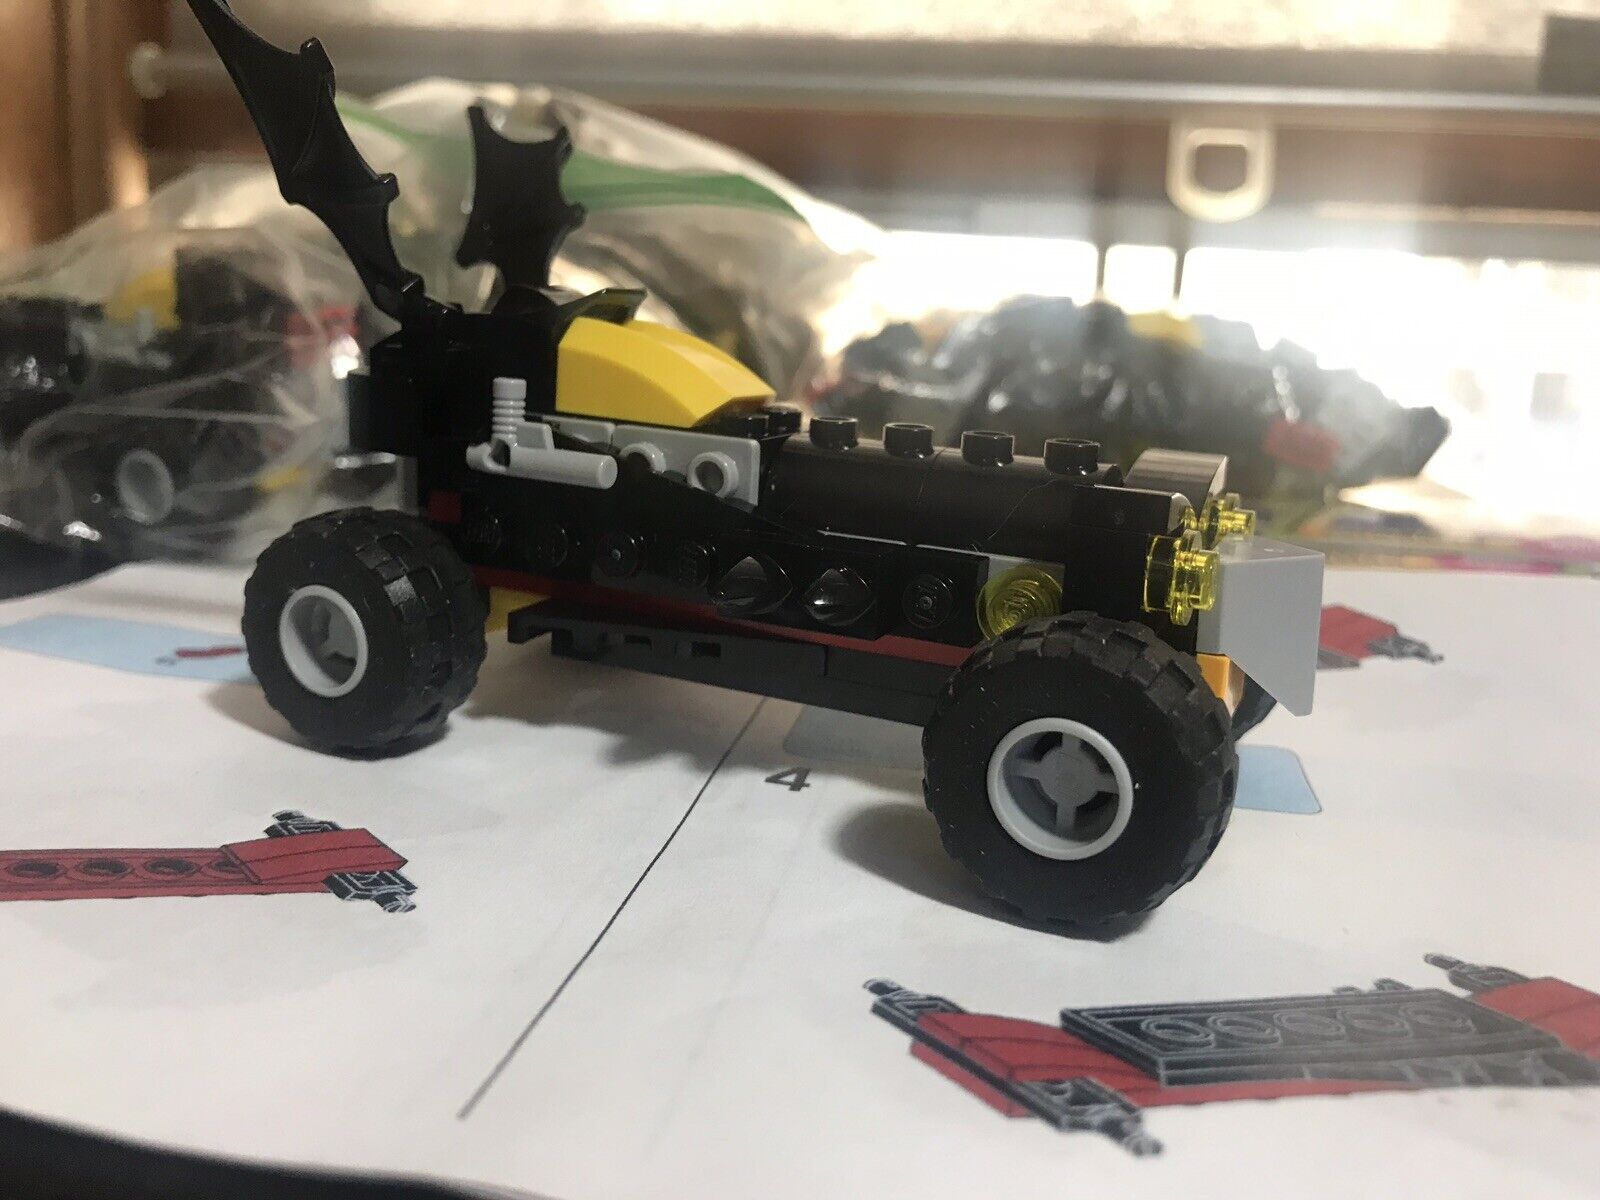 The Lego Batman Movie Batmobile SpeedAuto Barnes and Noble Masse Of 9 Plus voitureds